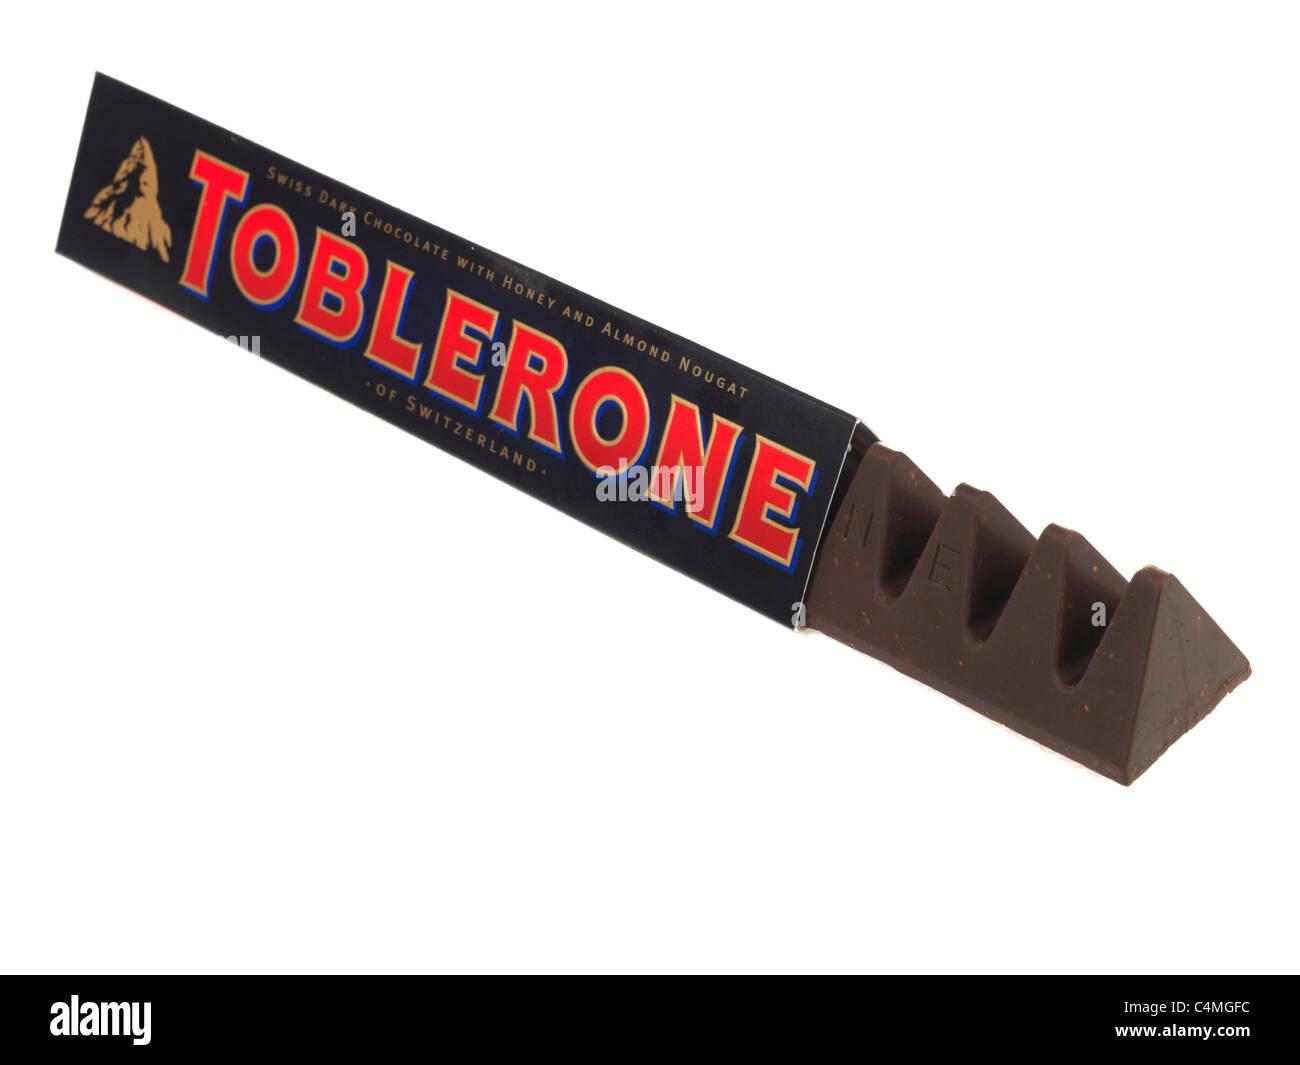 Toblerone Chocolate Bar Stock Photo, Royalty Free Image: 37331376 ...